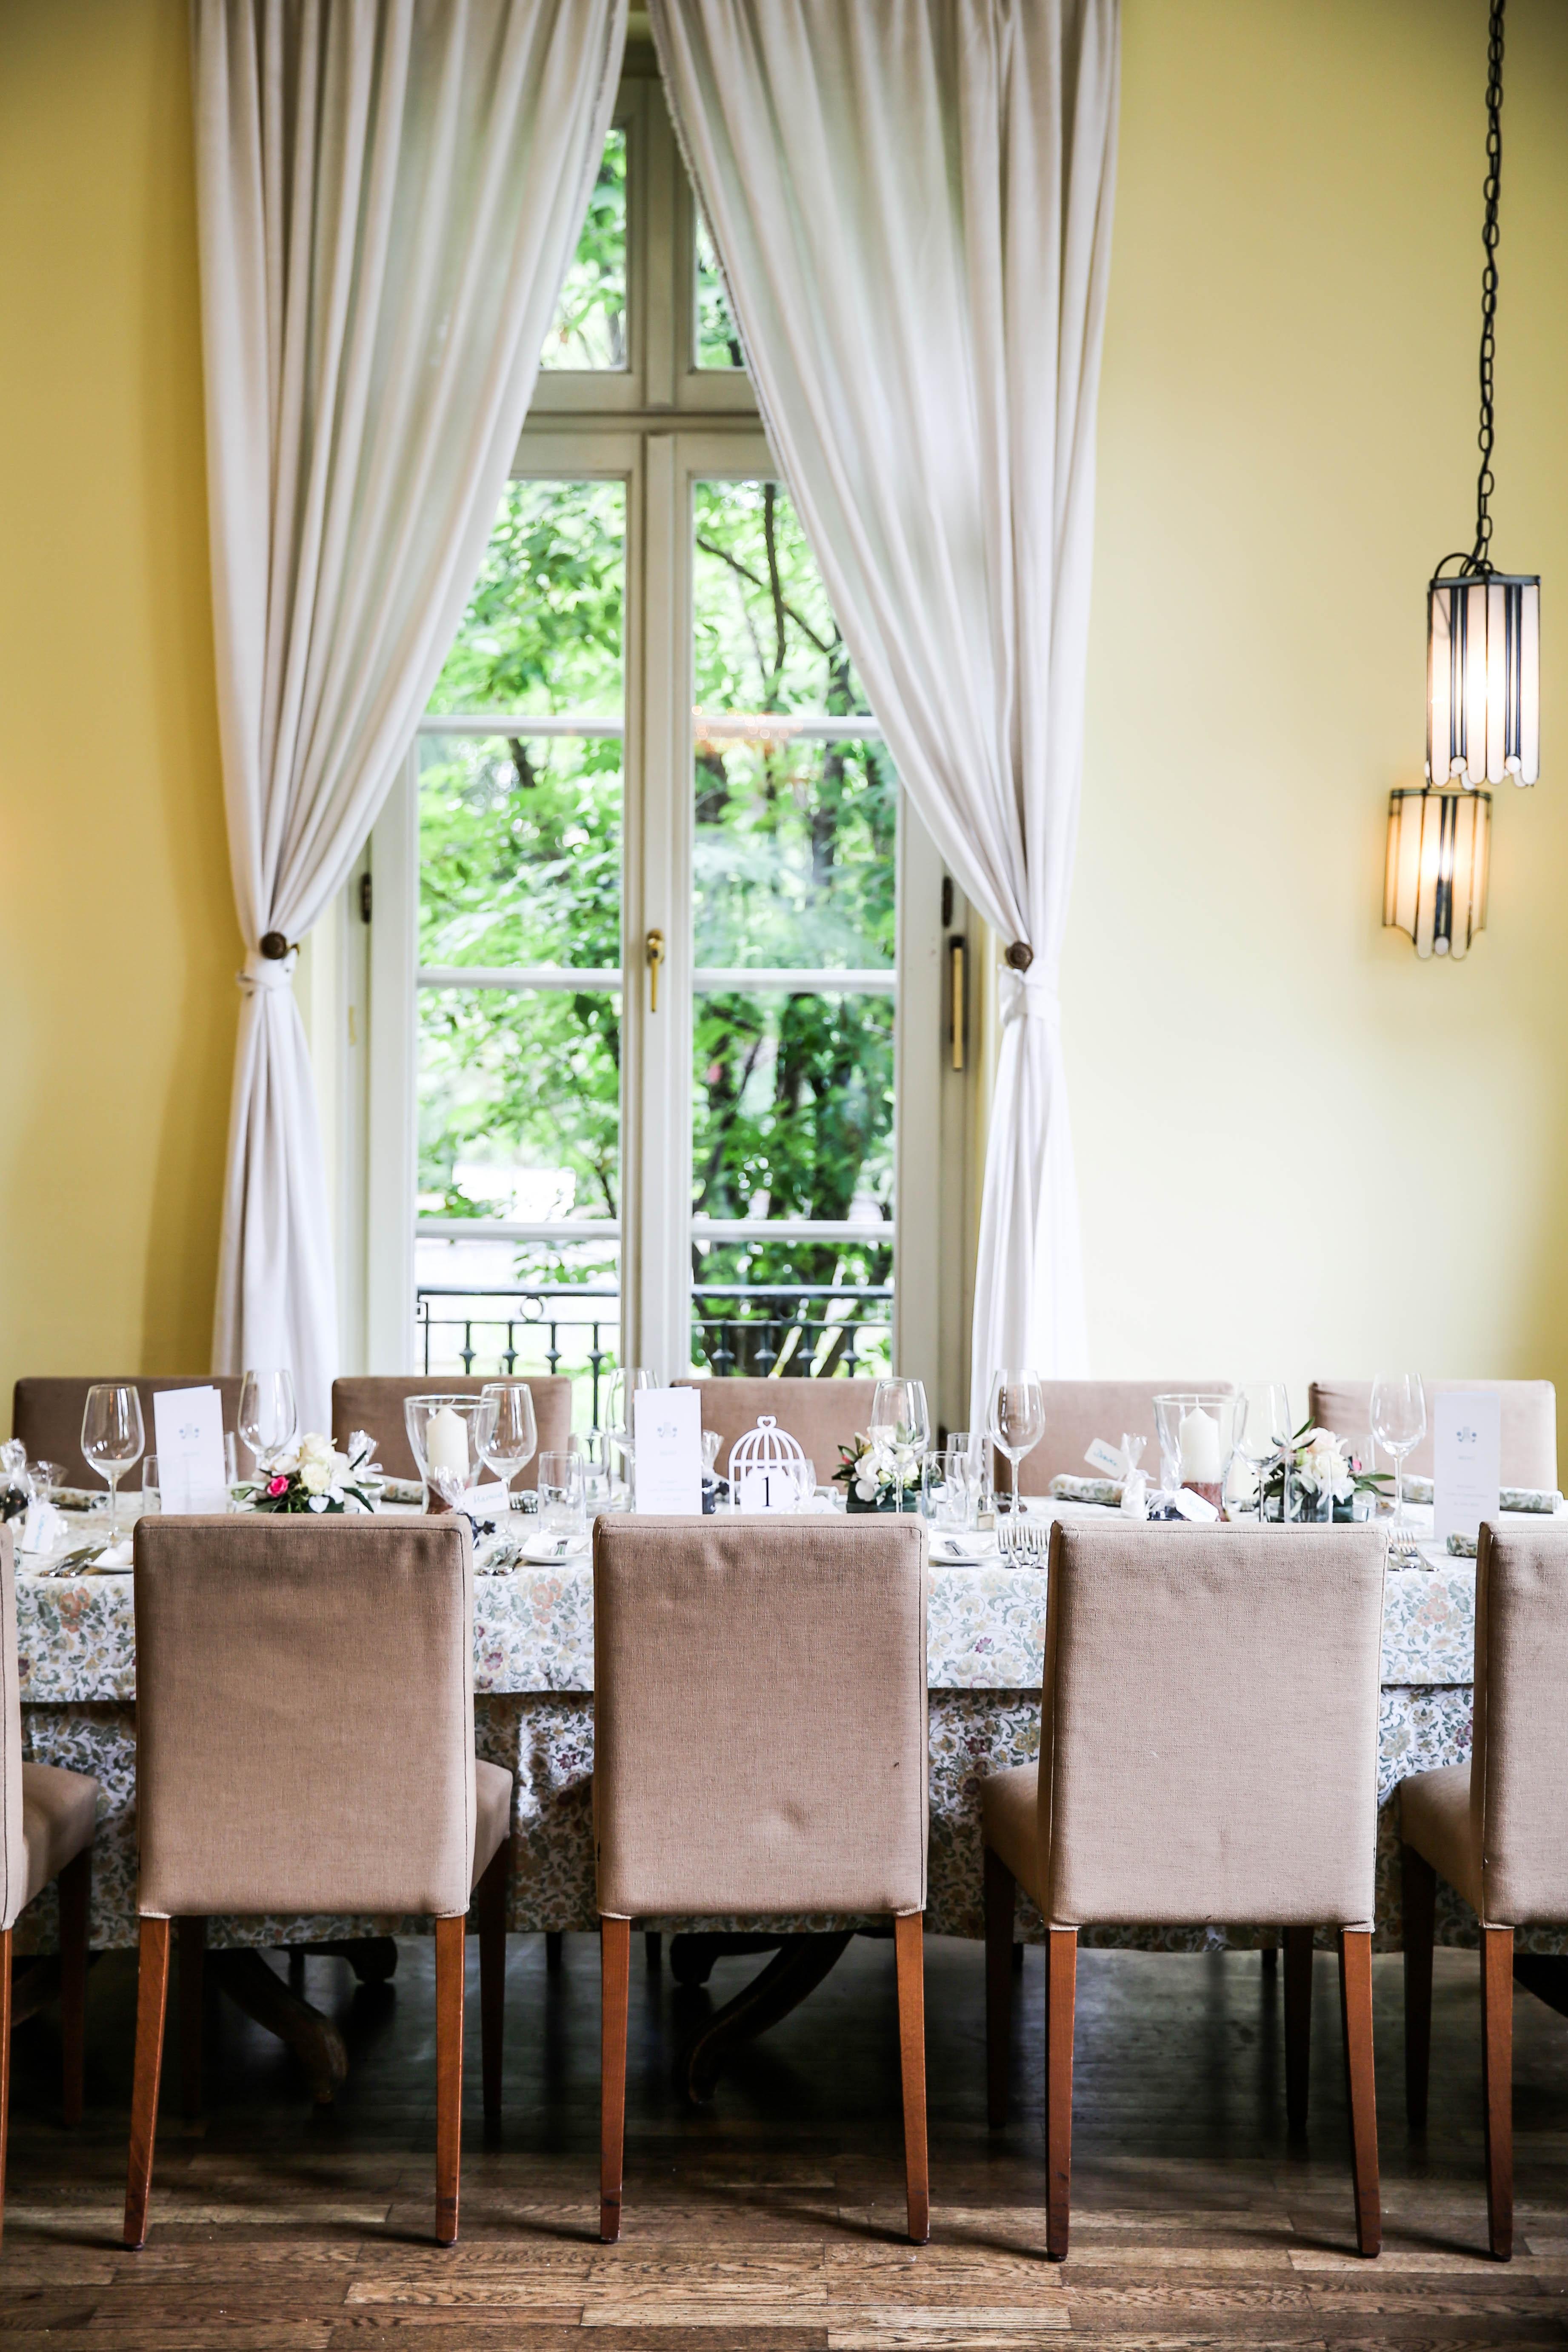 Free Images Table Restaurant Home Decoration Curtain Wedding Interior Design Textile